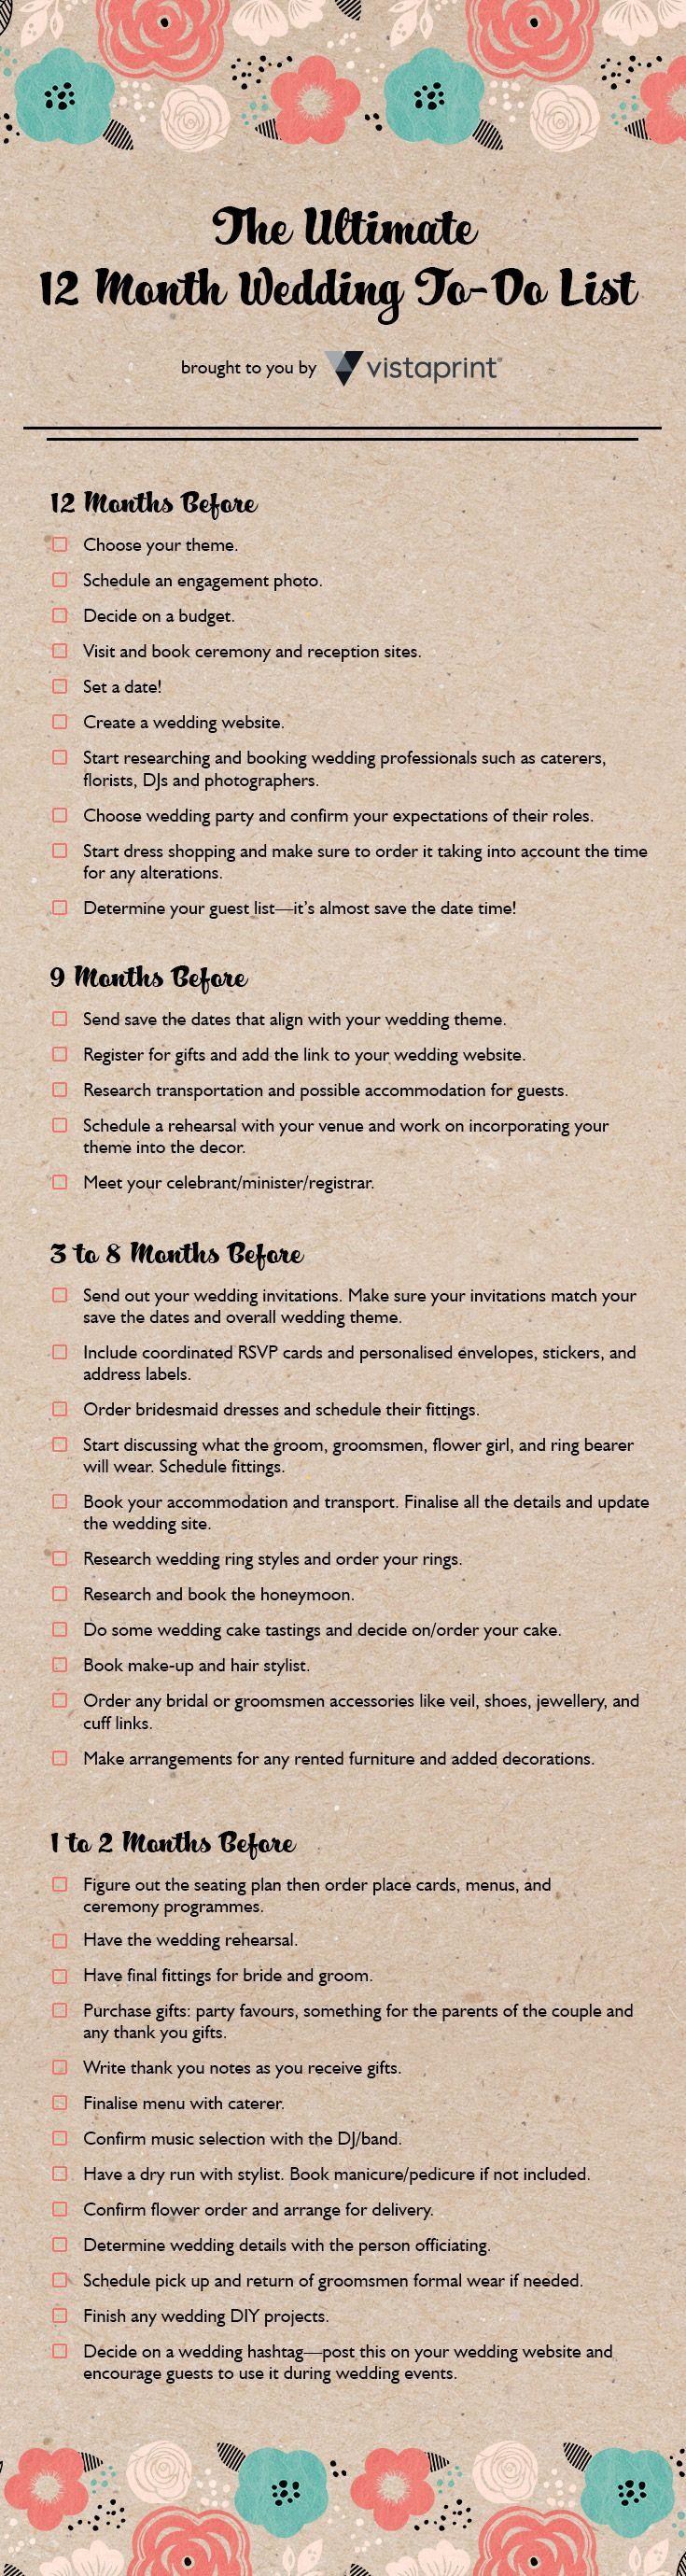 This is so helpful - VistaPrint's wedding planning checklist.